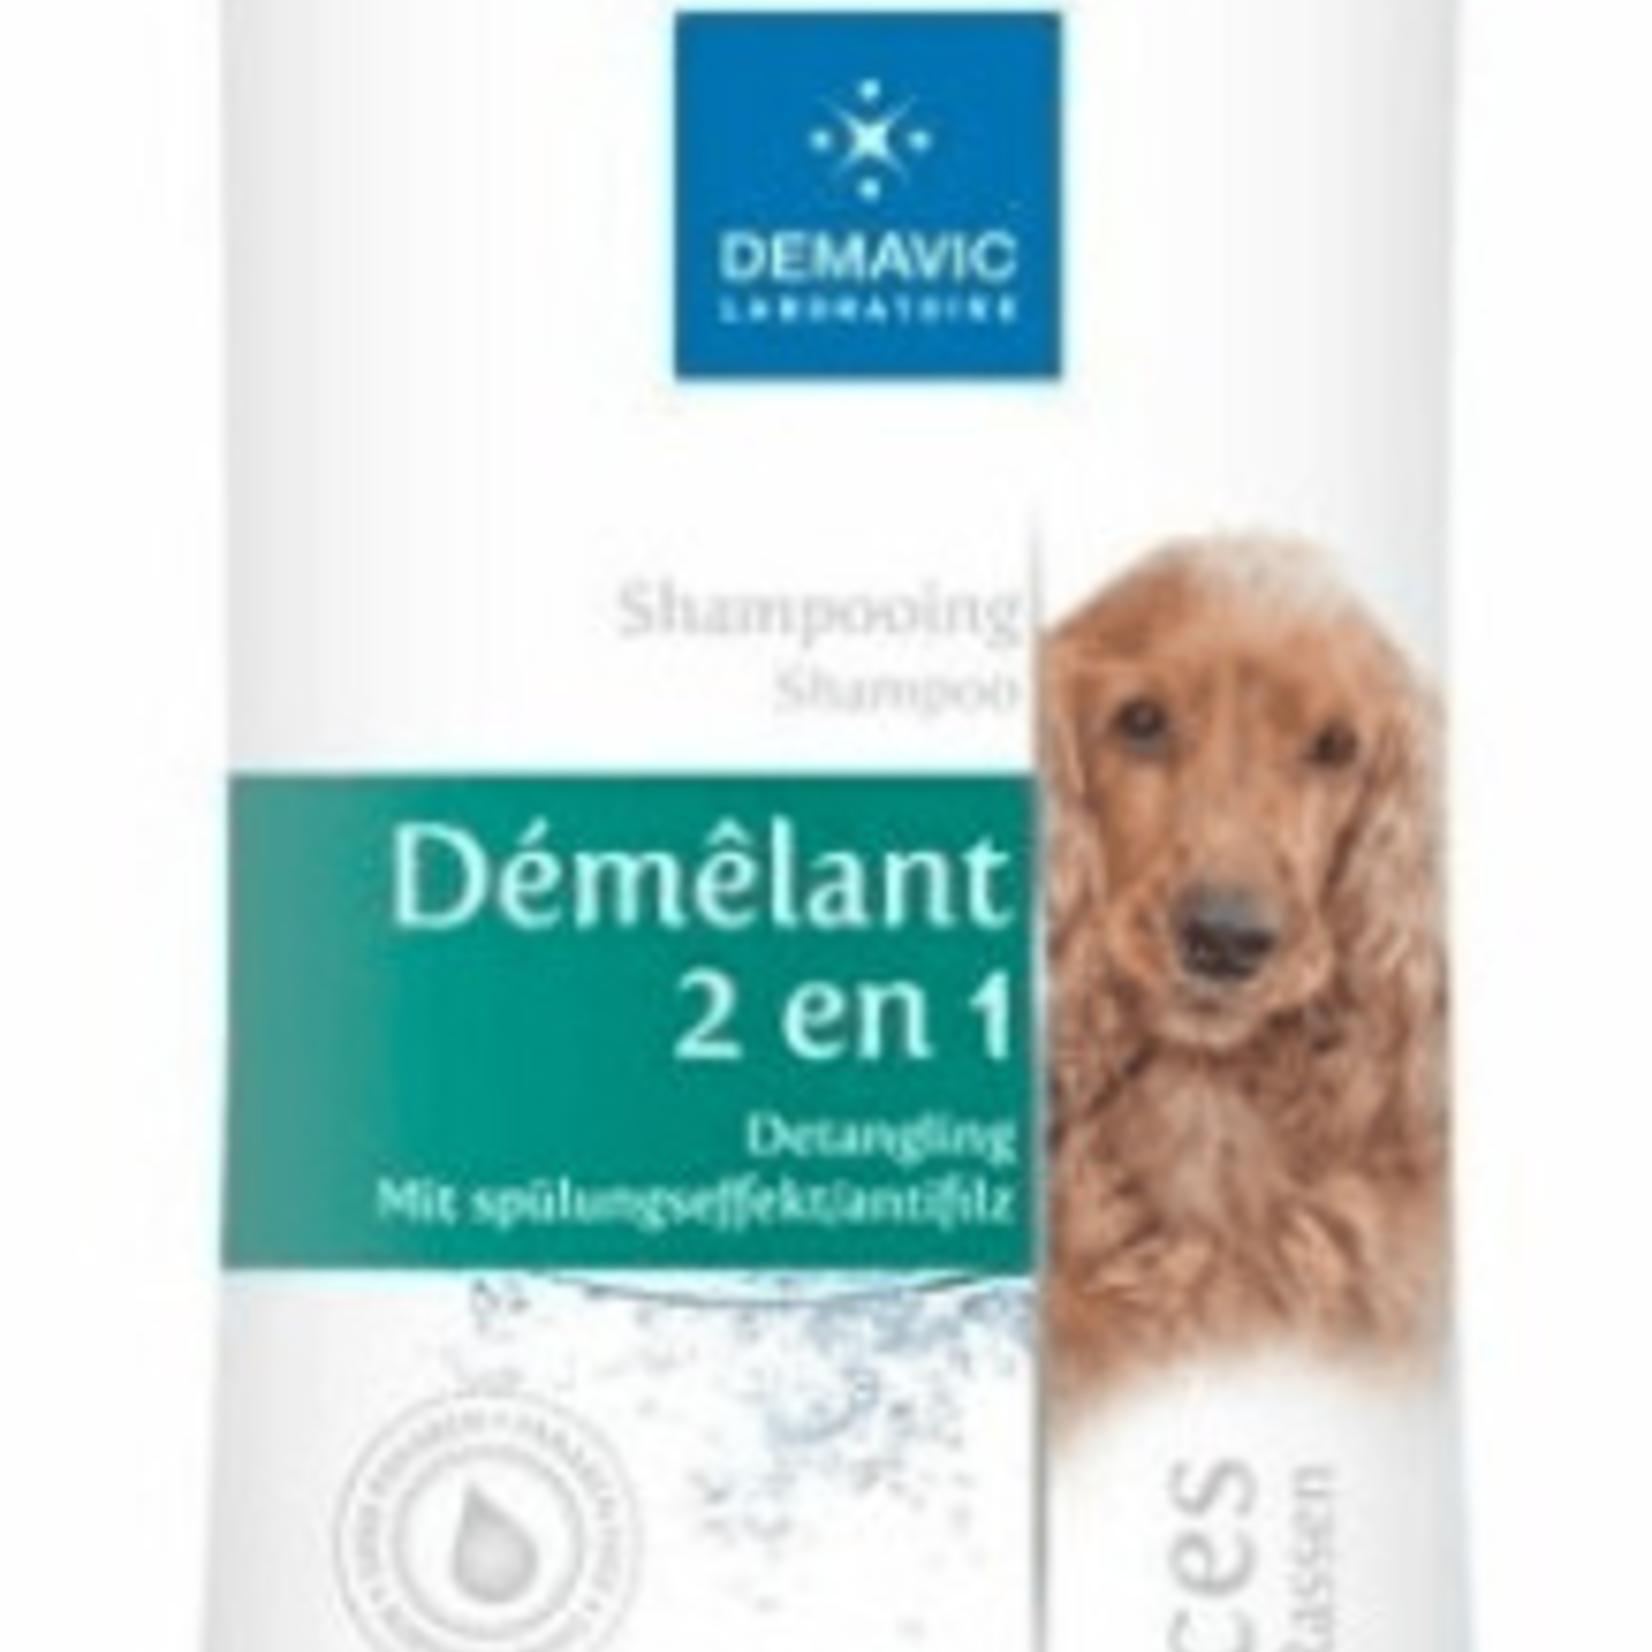 Demavic Detangling Shampoo 2 in 1-250 ml